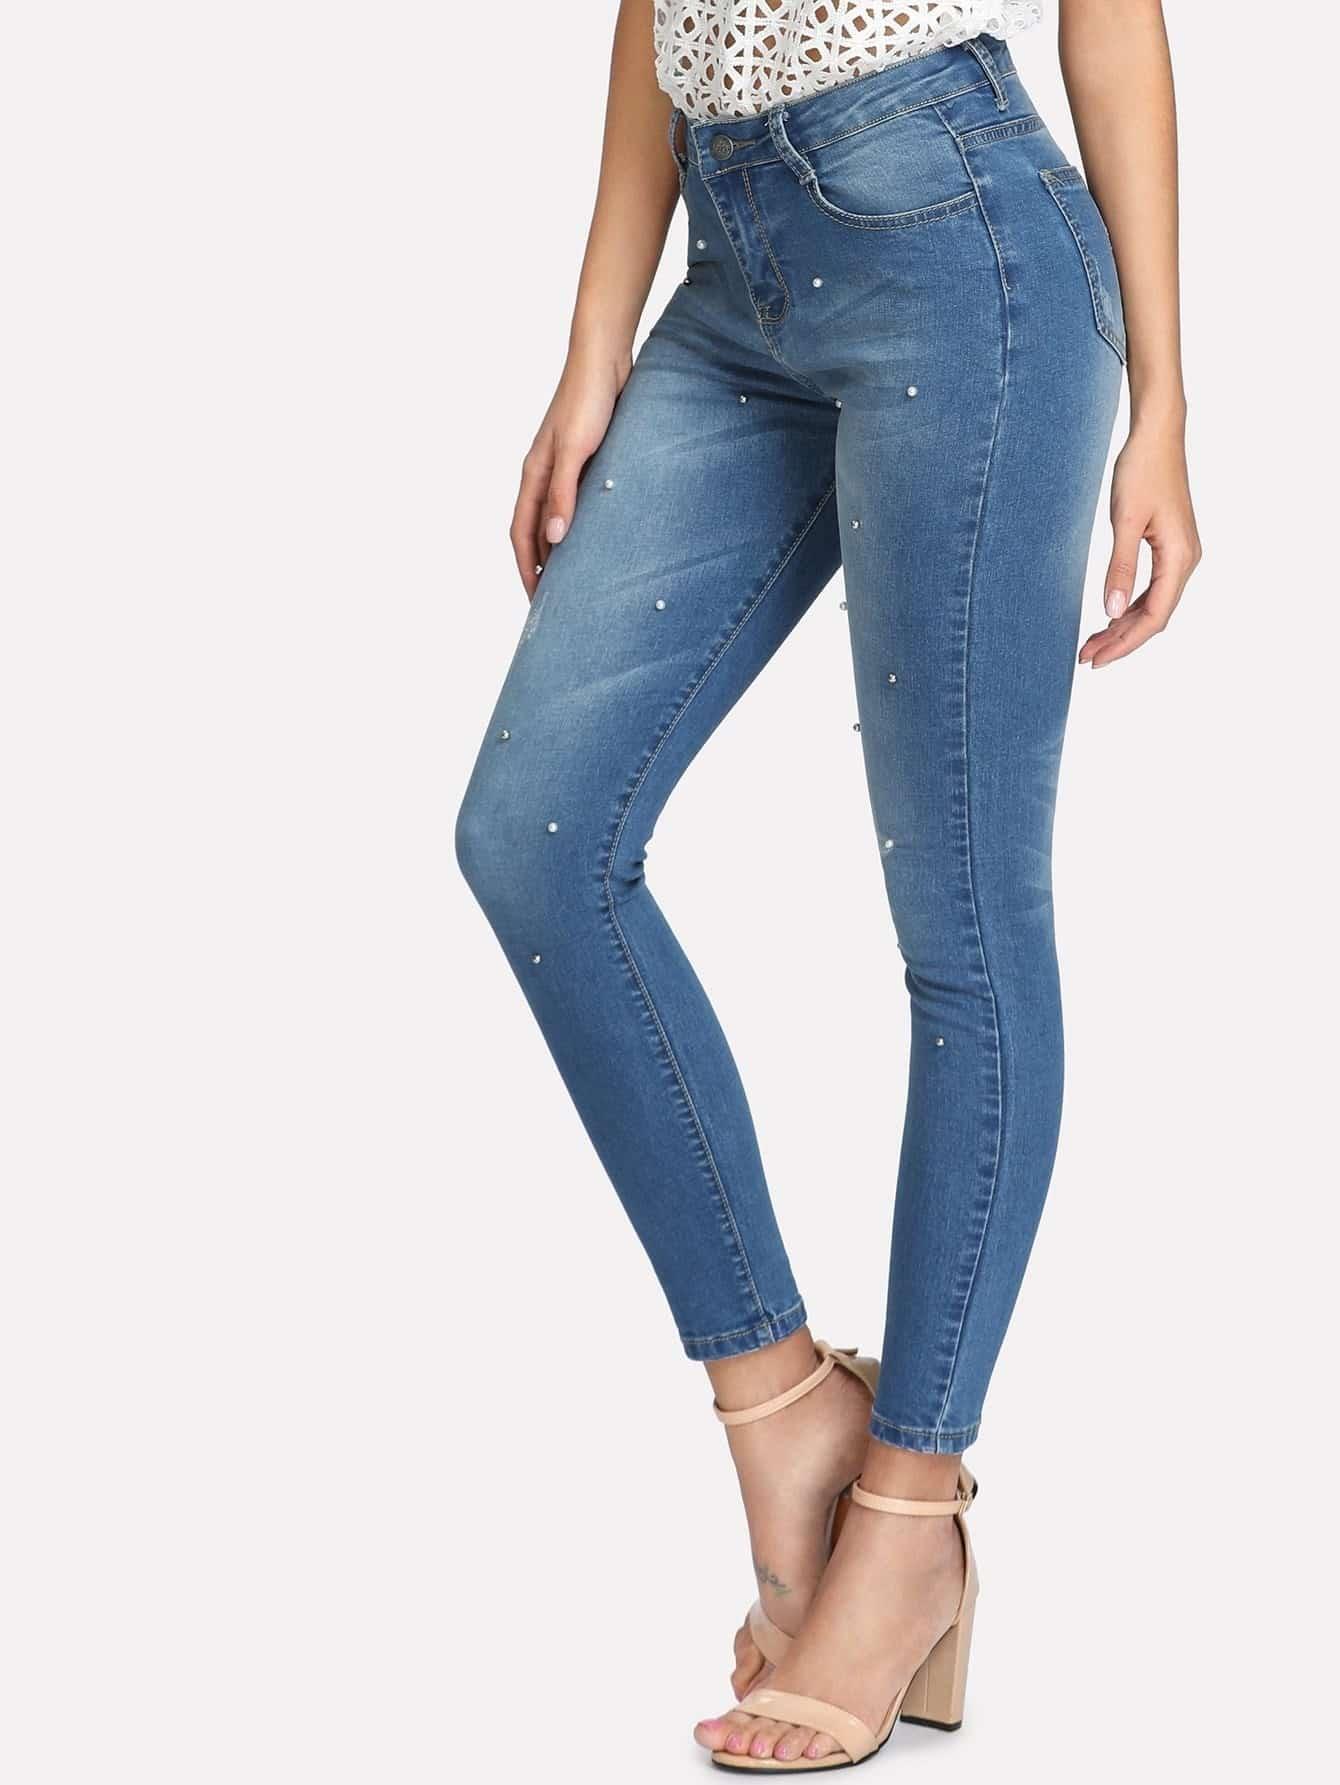 Beaded Skinny Jeans